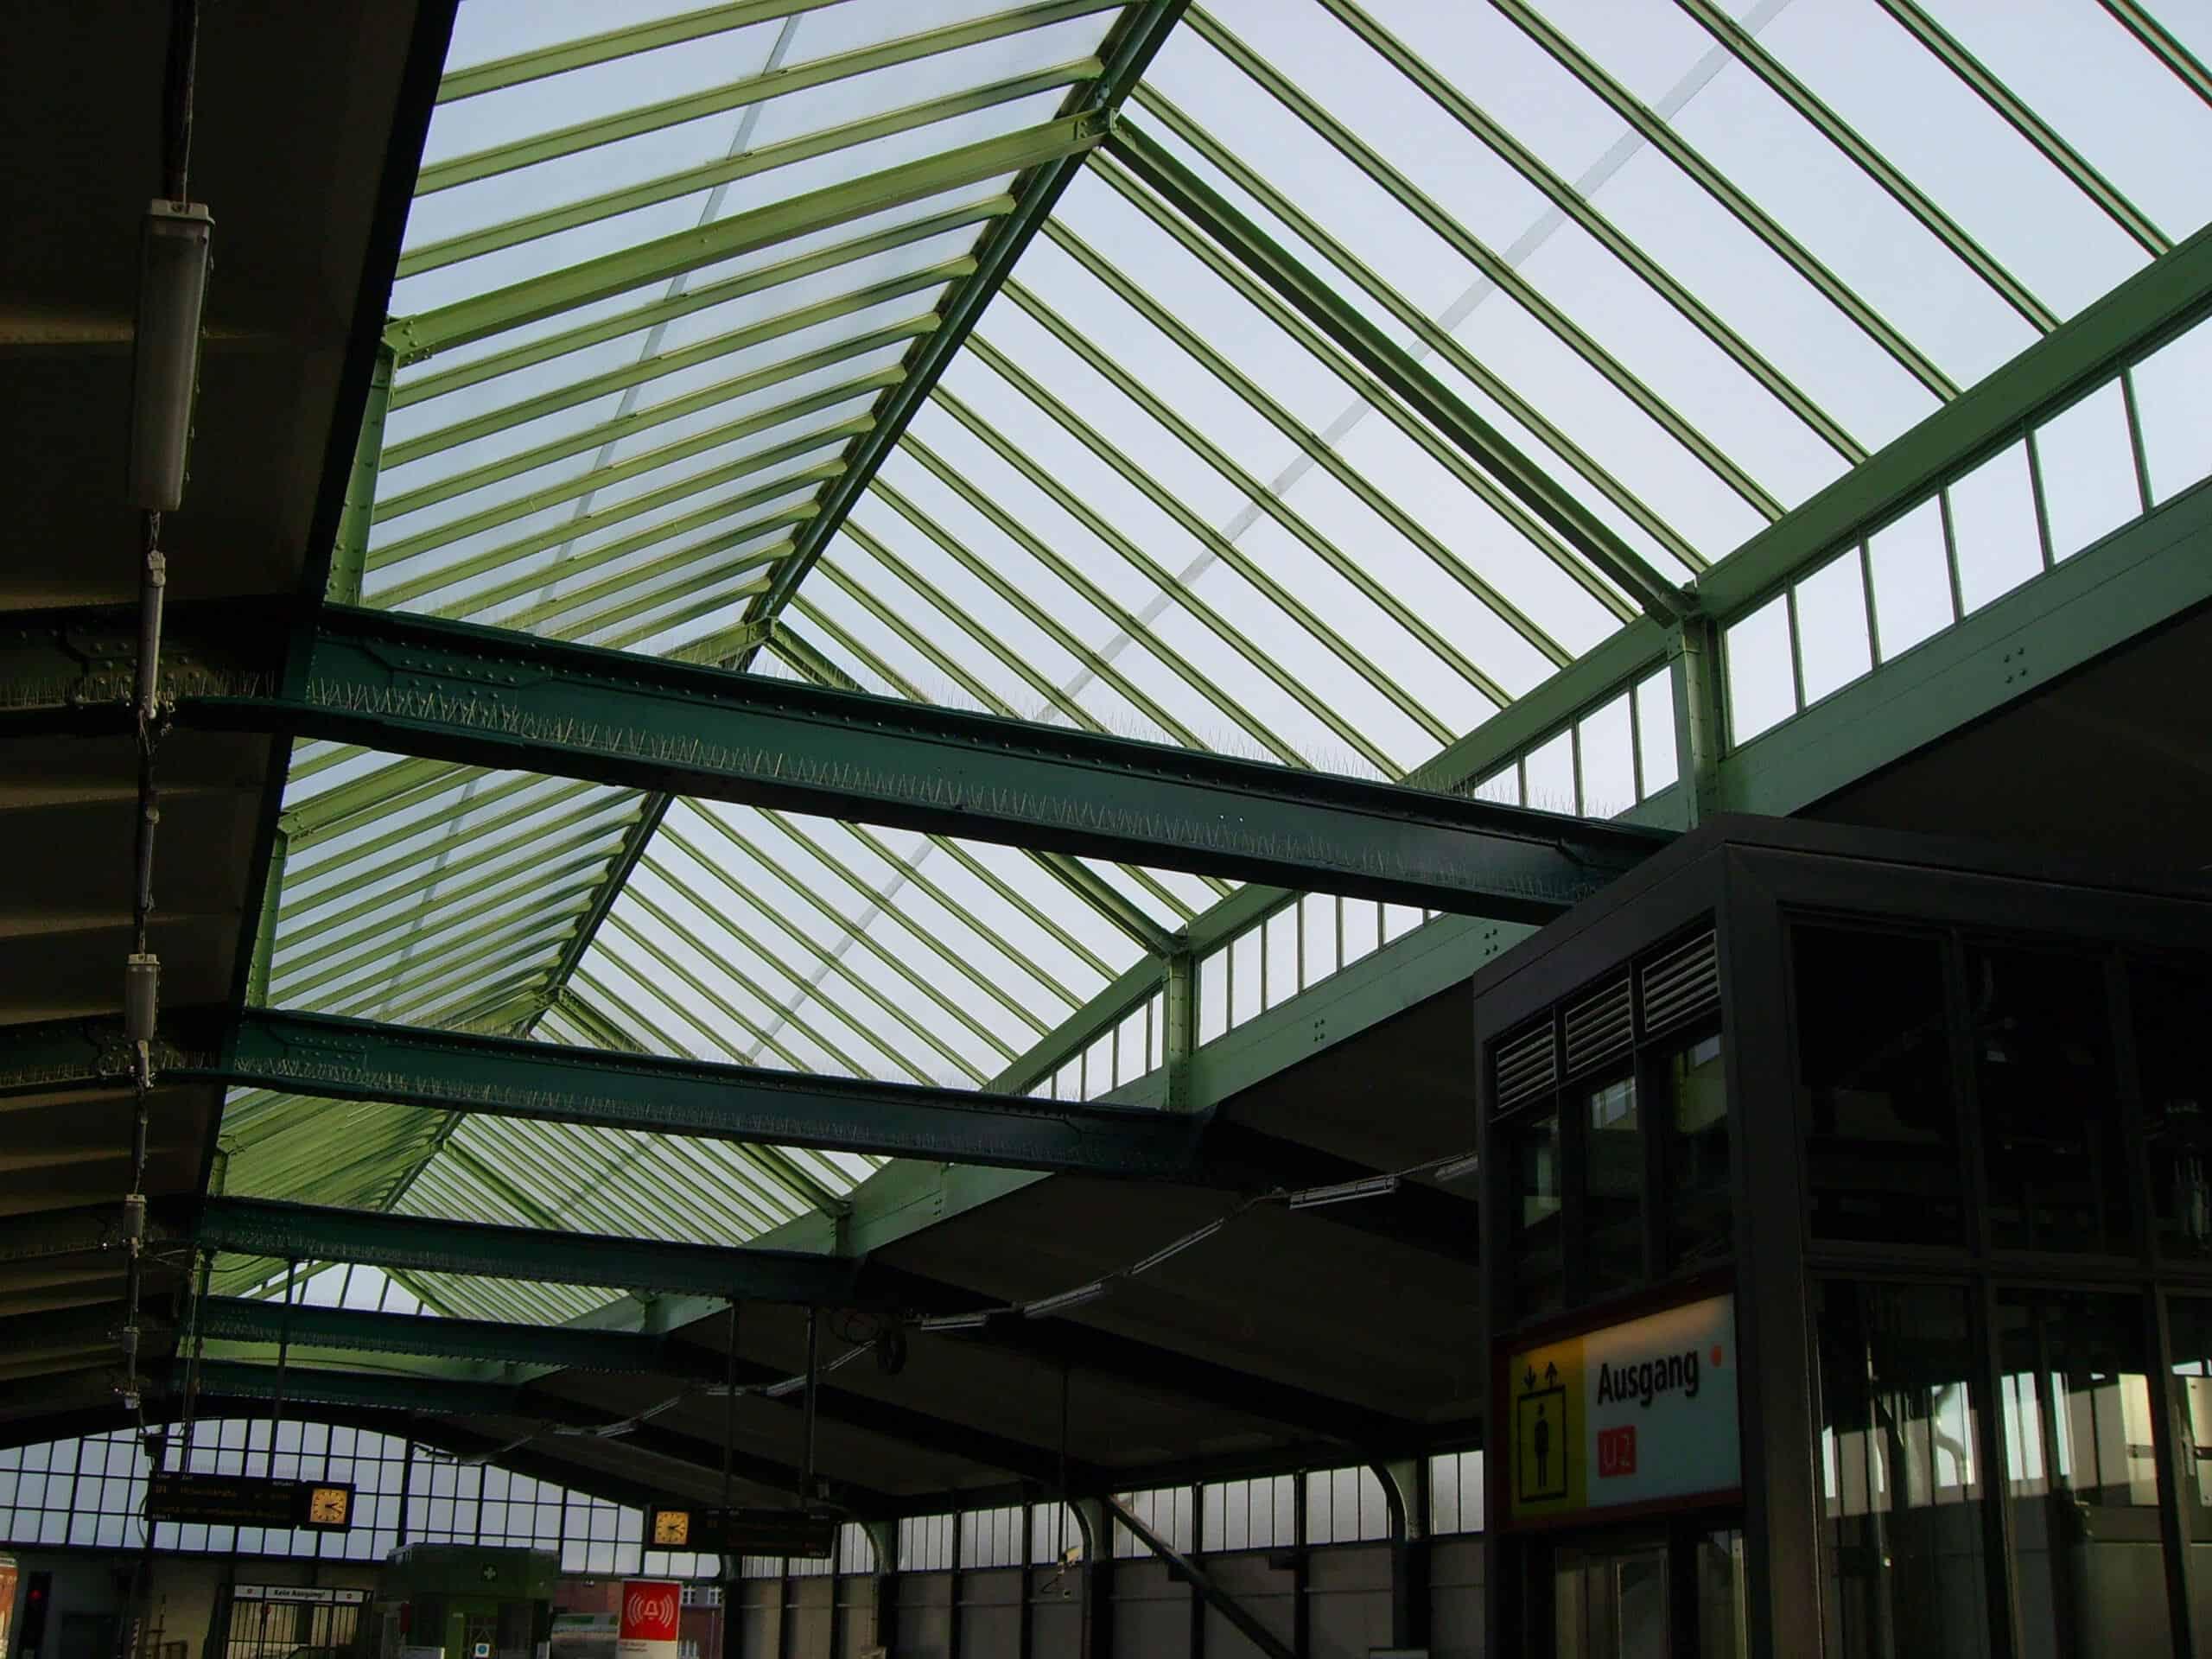 S2 - U-Bahnhof Gleisdreieck – Berlin 6